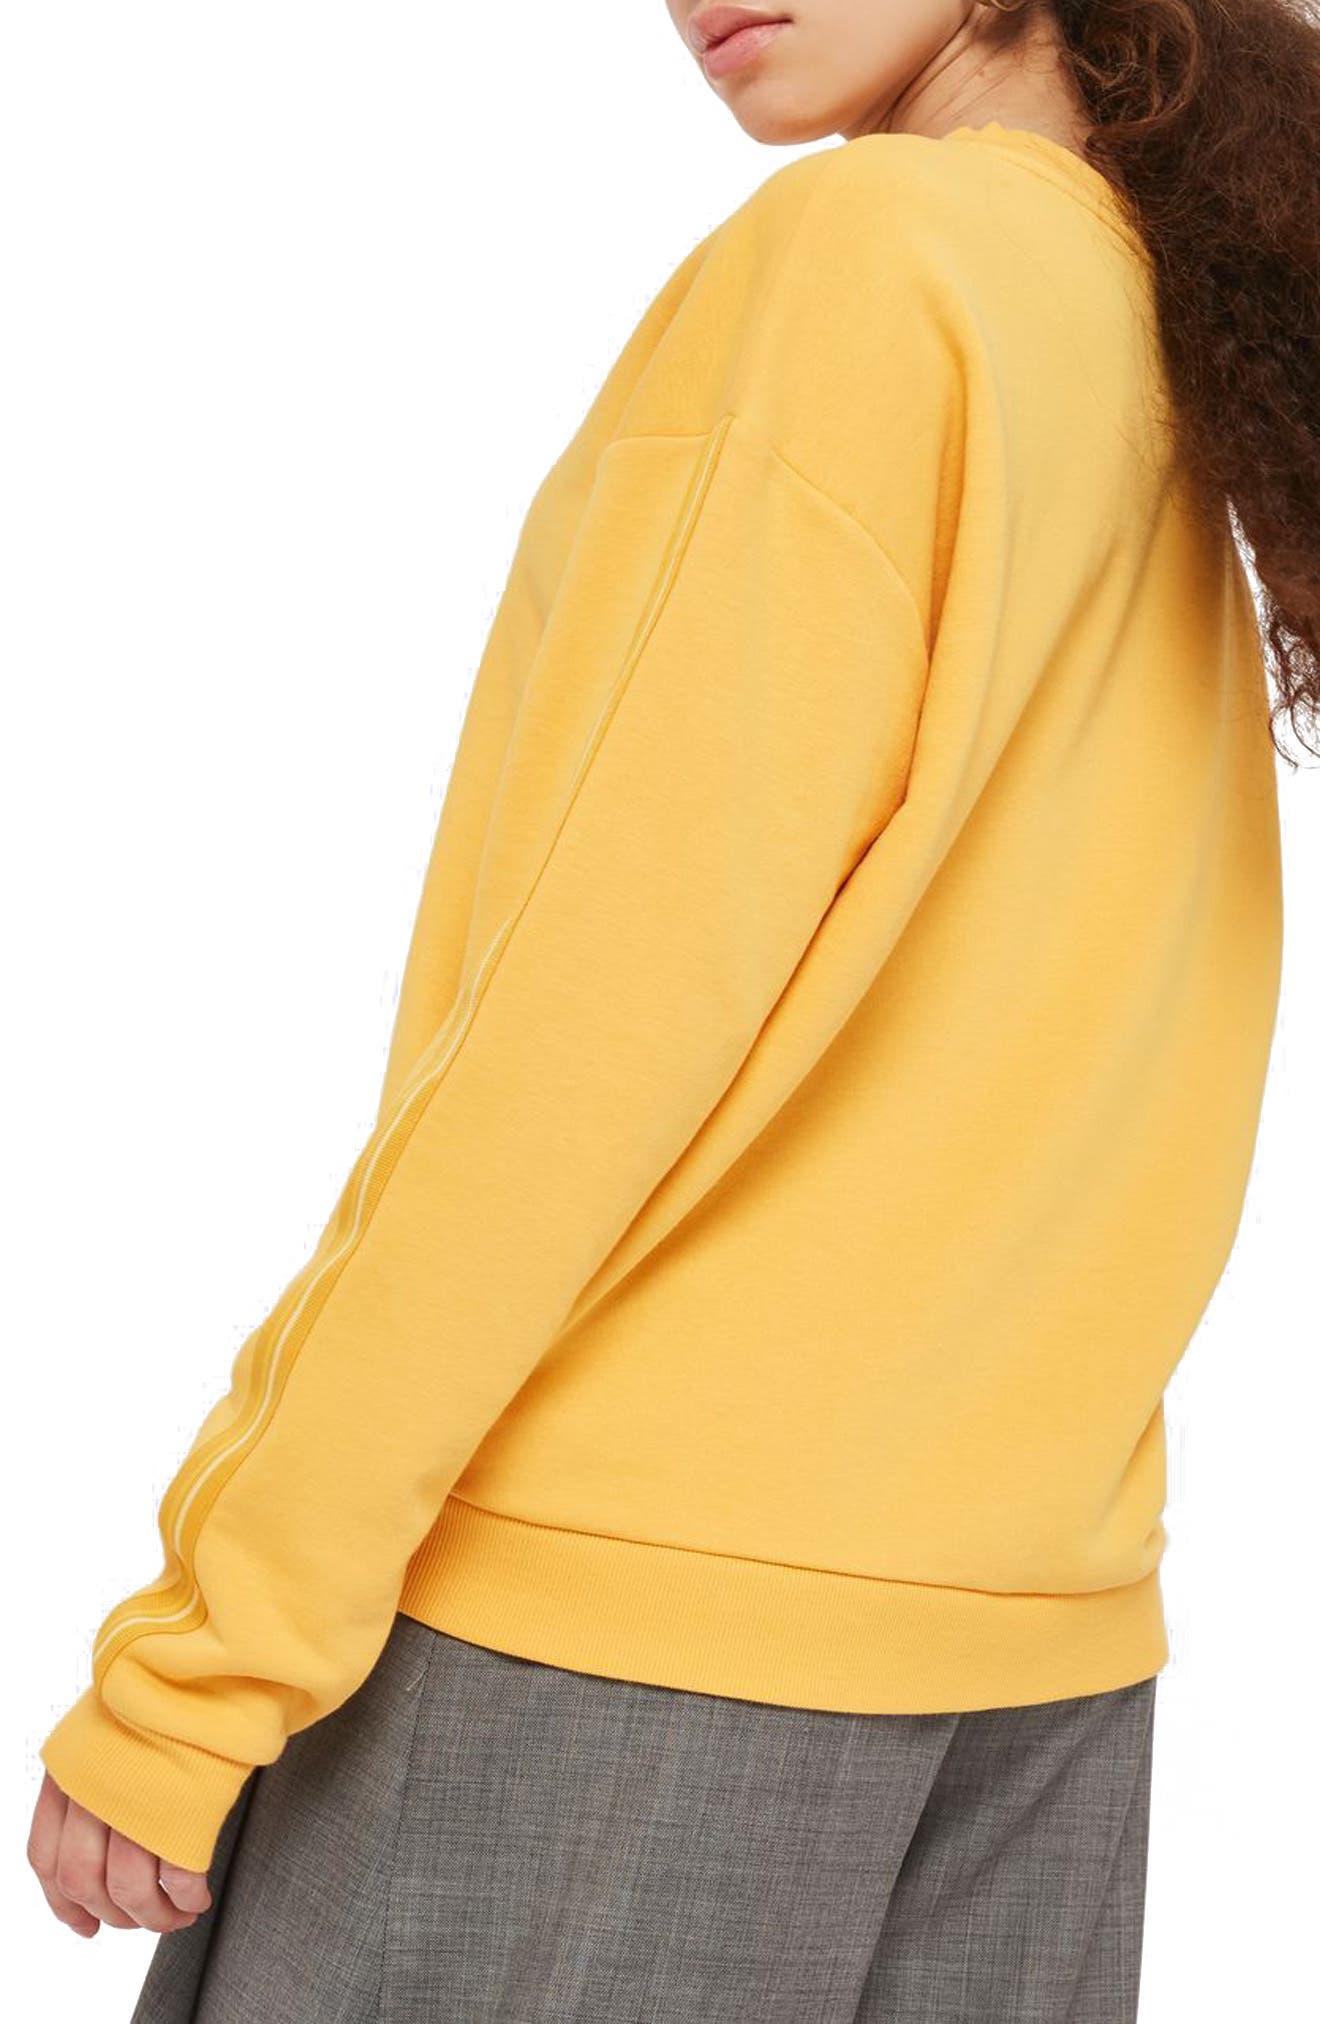 Taped Sleeve Sweatshirt,                             Alternate thumbnail 3, color,                             Mustard